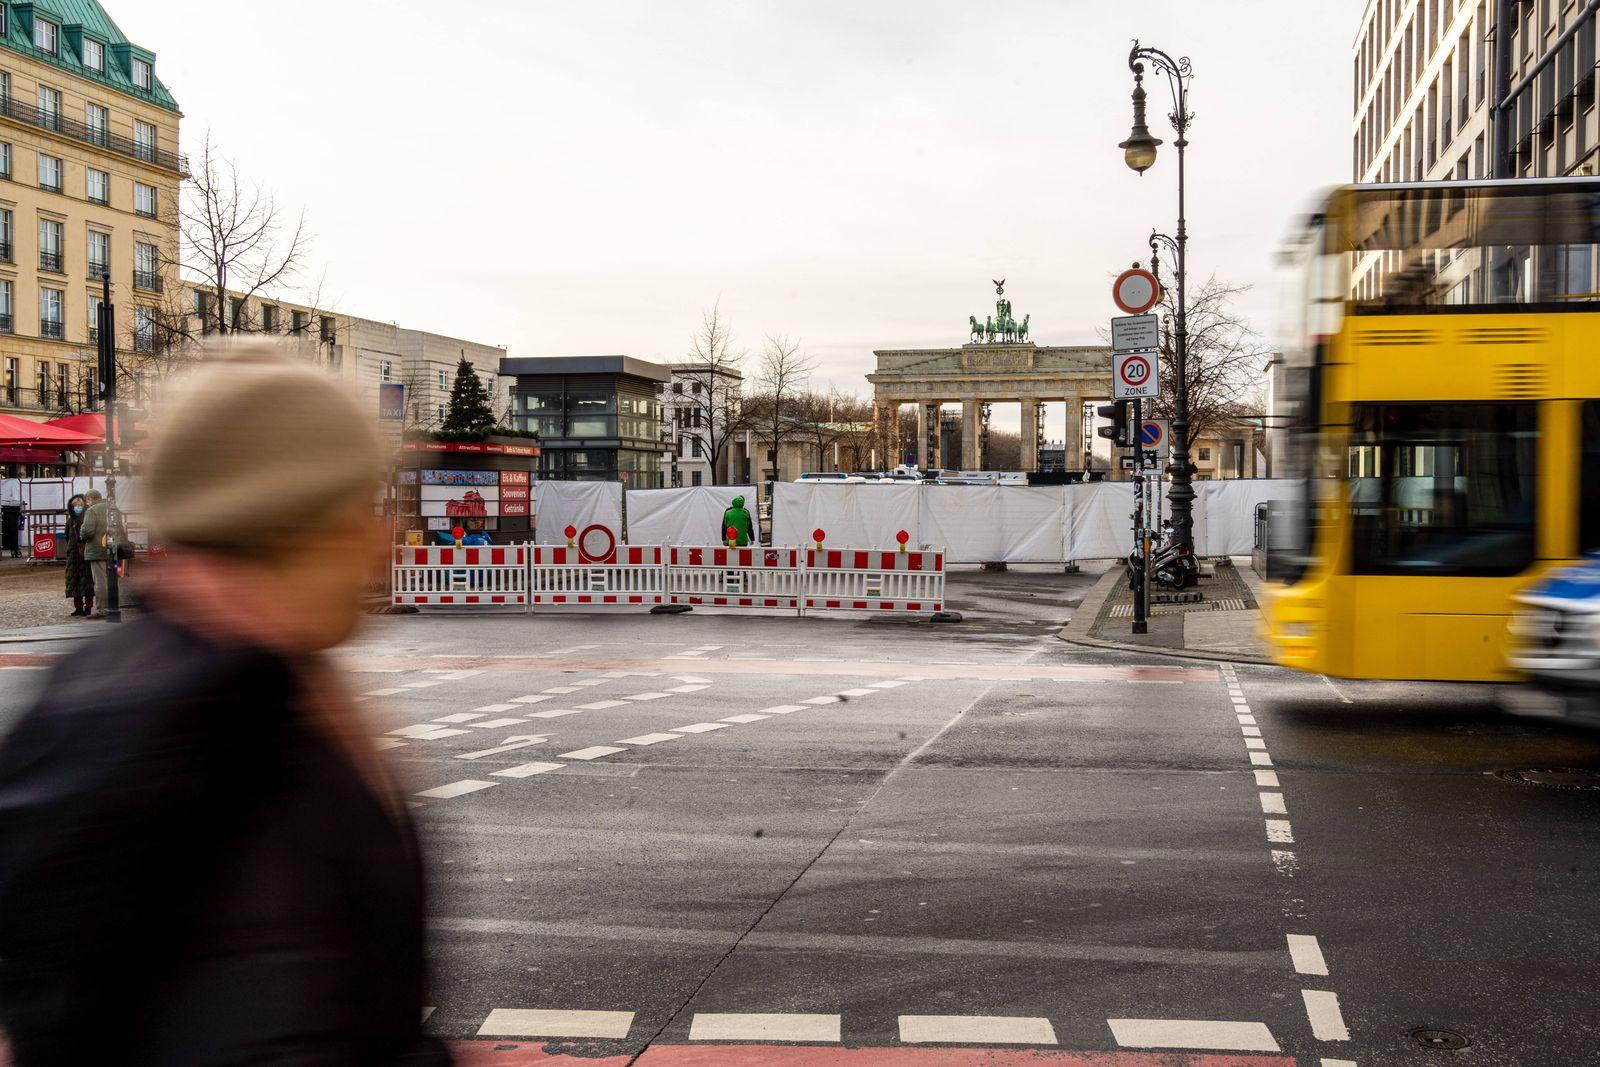 31.12.2020,Berlin,Deutschland,GER,Sperrung Pariser Platz am Brandenburger Tor. *** 31 12 2020,Berlin,Germany,GER,Parise